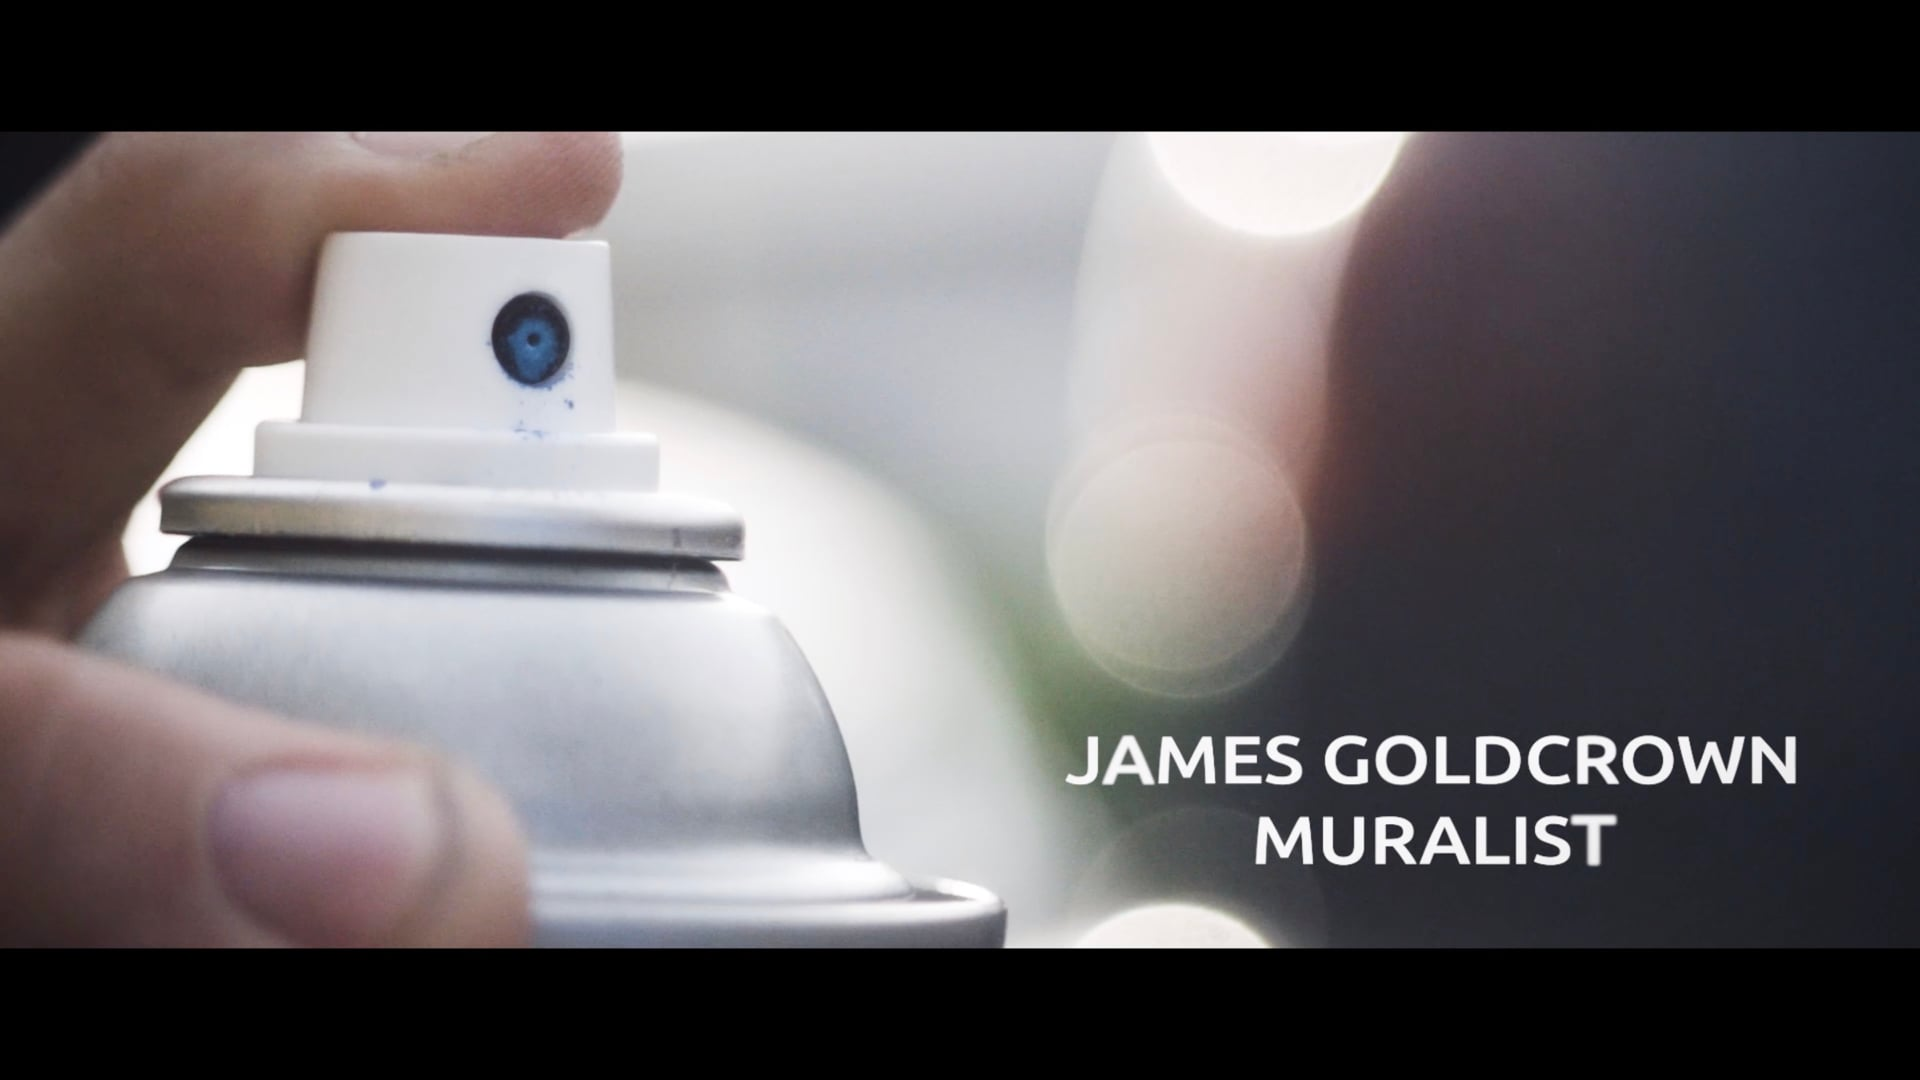 Muralist James Goldcrown - Web Series Teaser